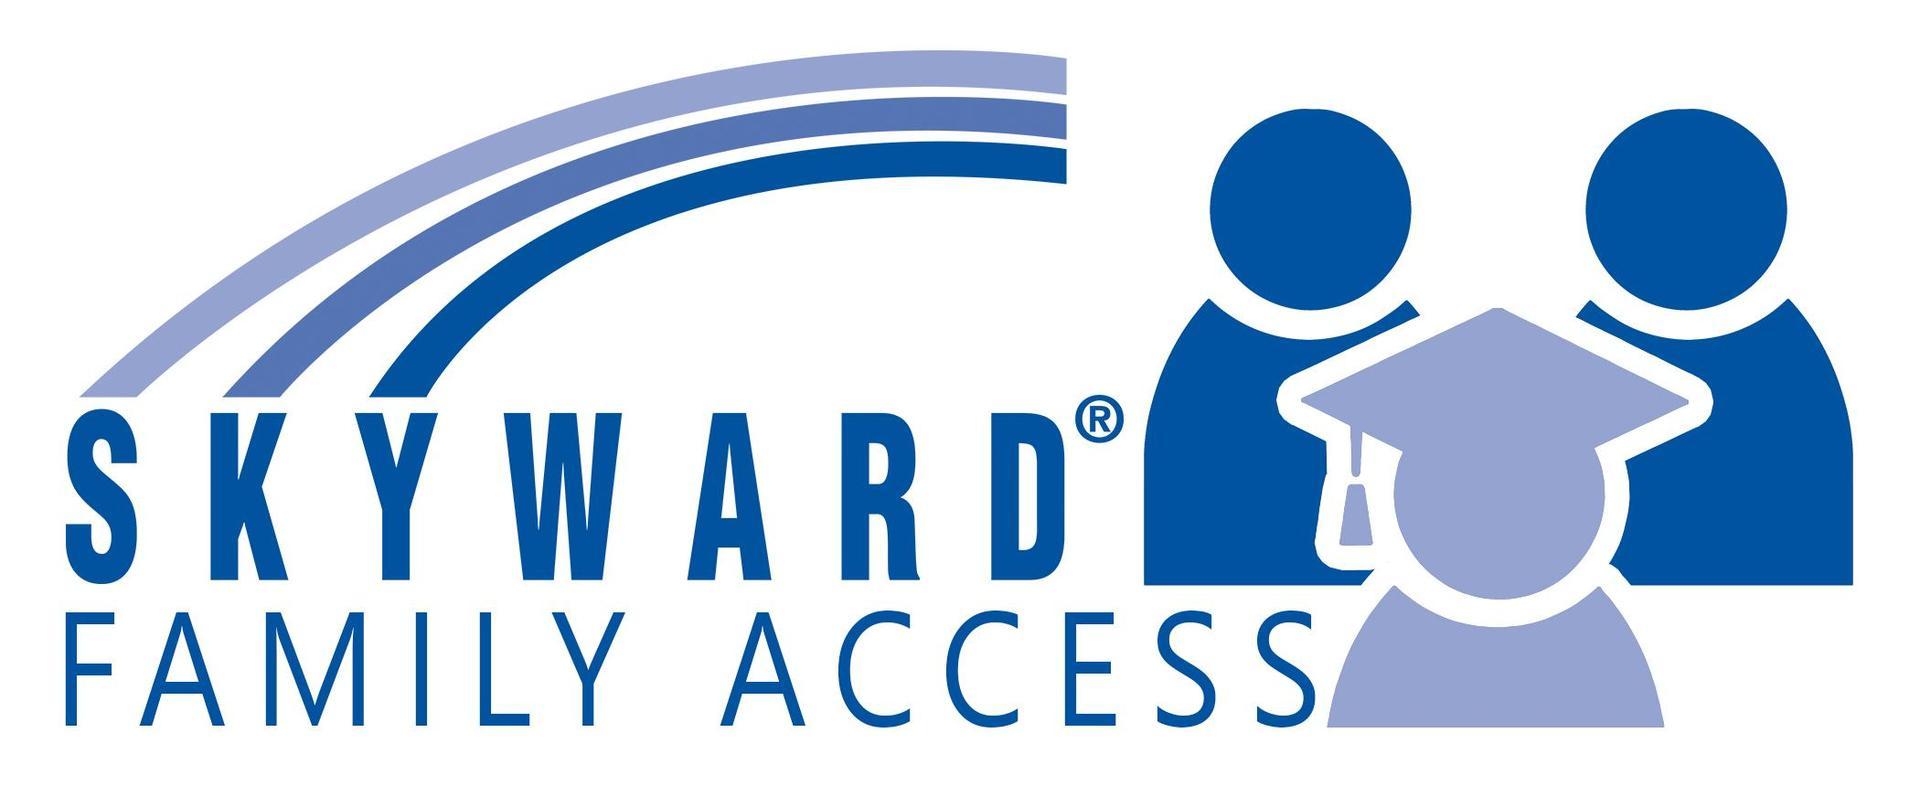 clipart of Skyward logo